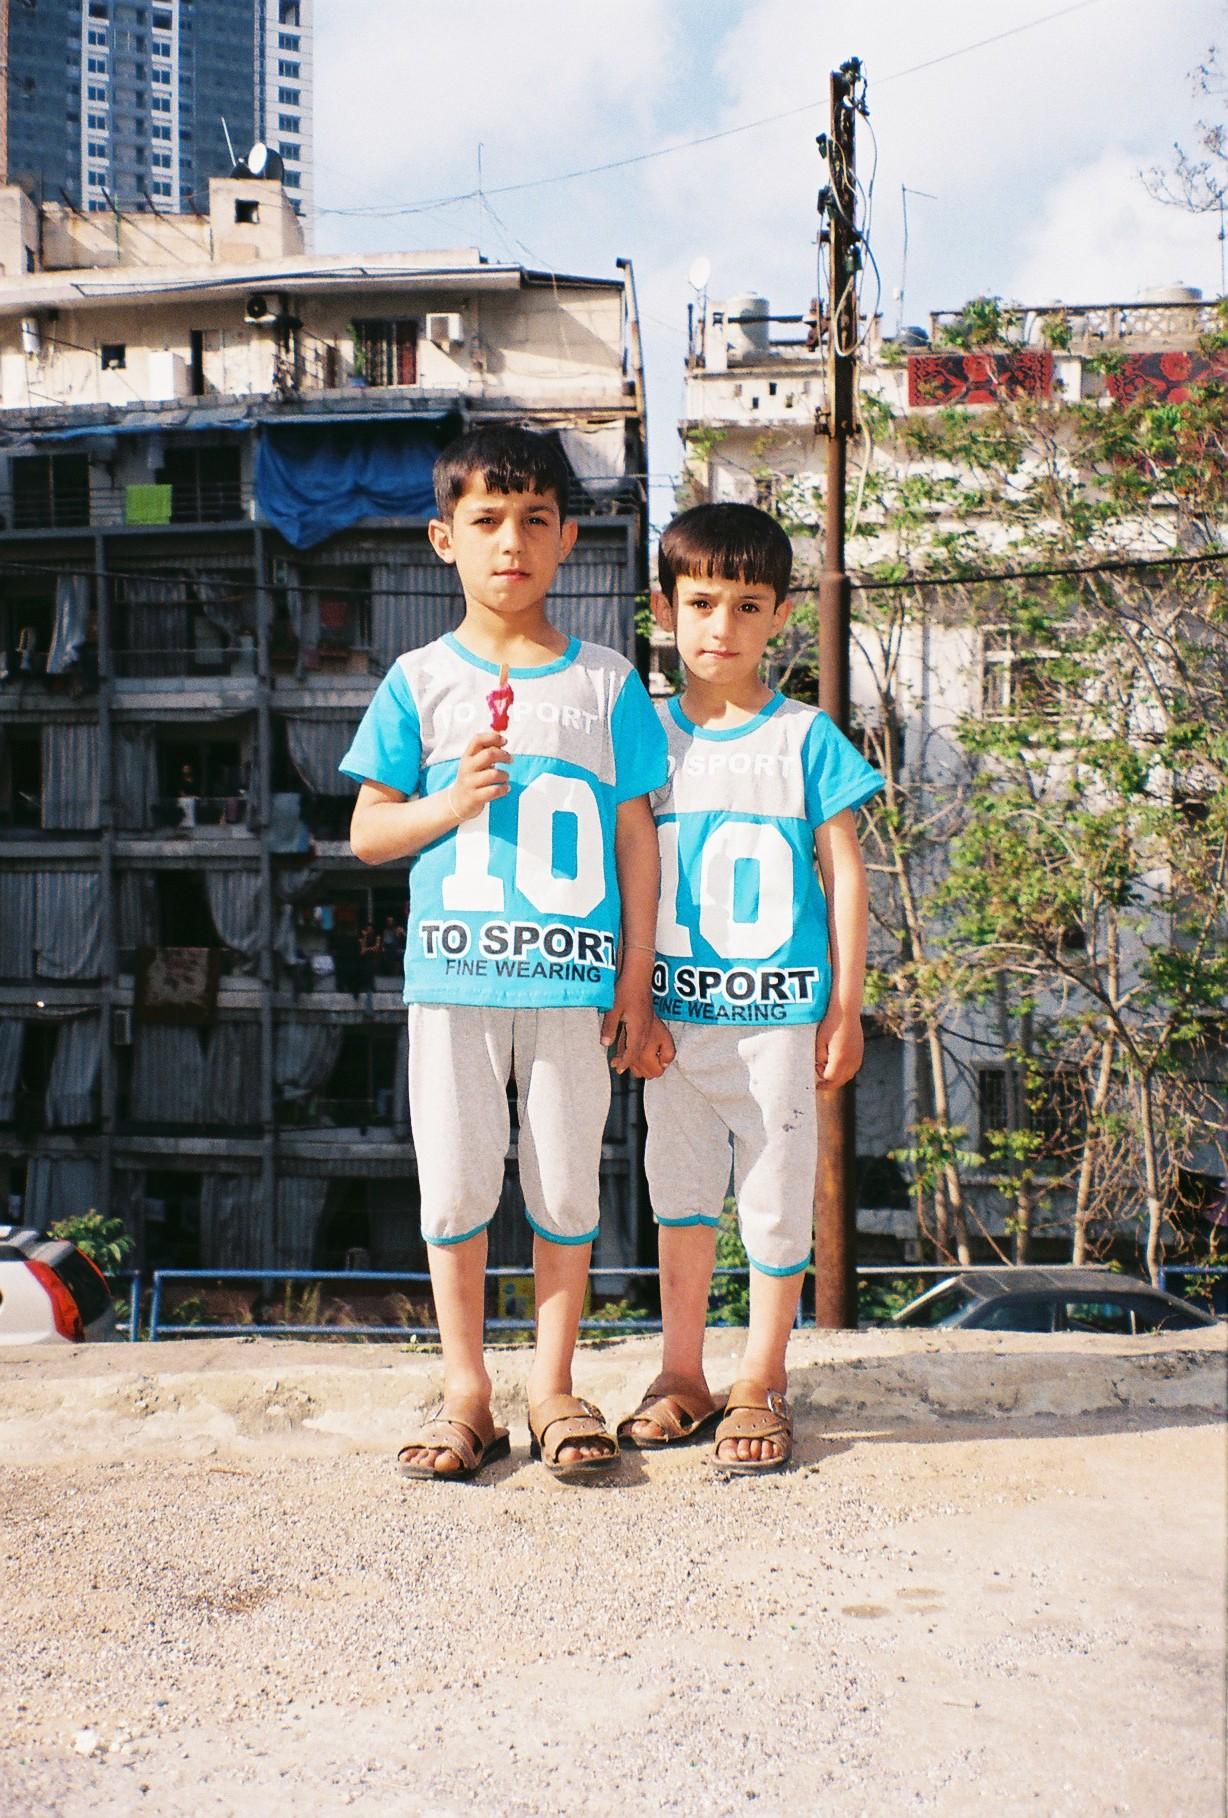 Syrian refugees, Beirut 2017.